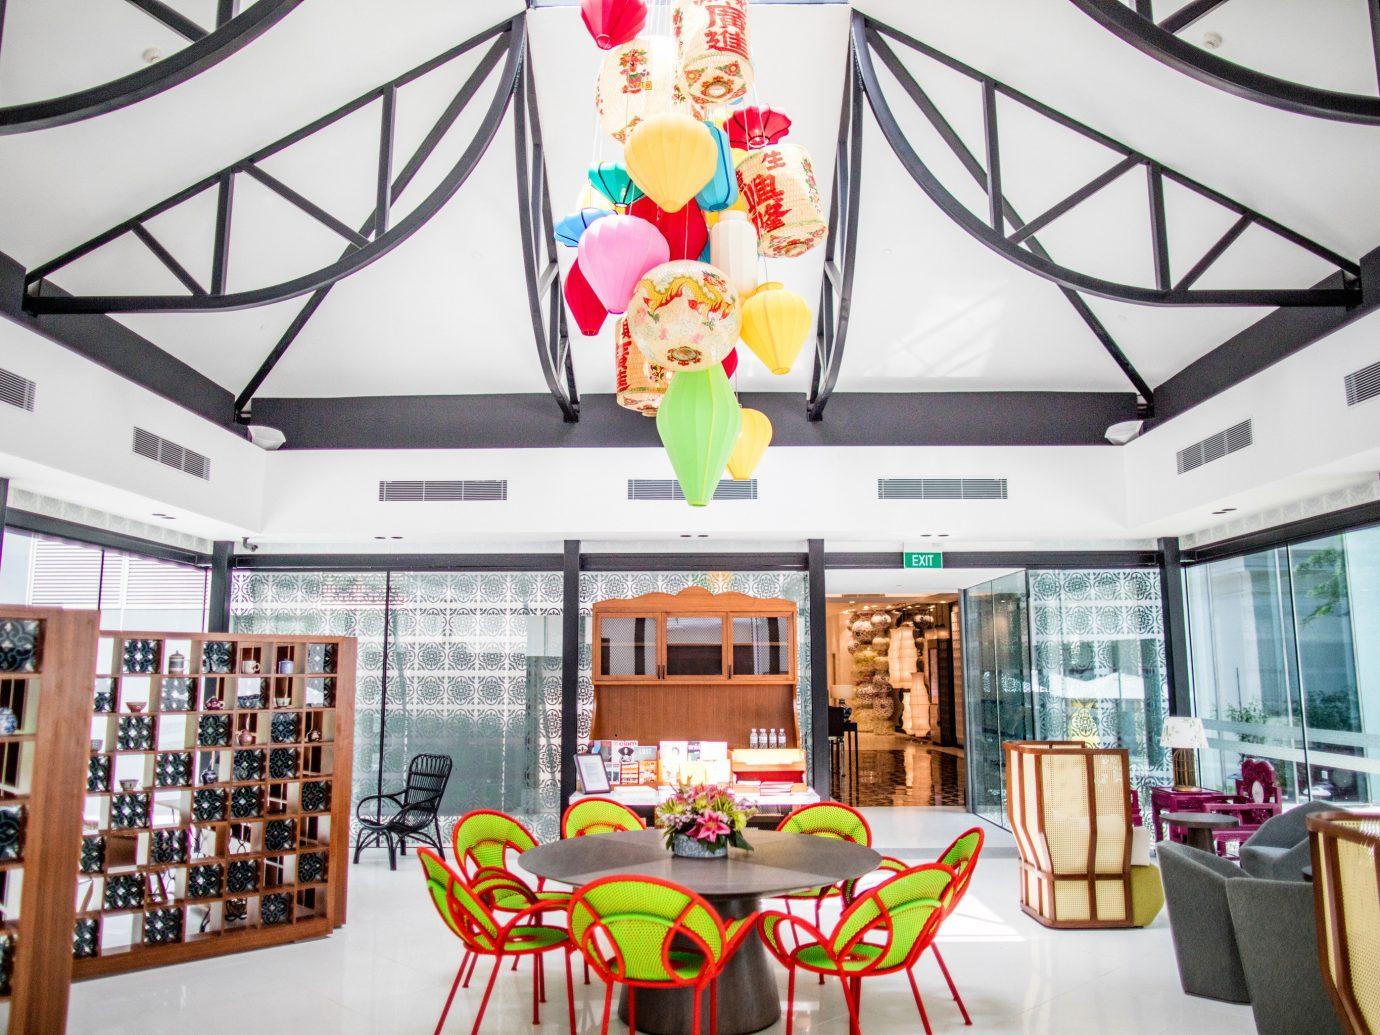 Hotels table indoor chair room ceiling scene interior design home Design estate Boutique Lobby furniture